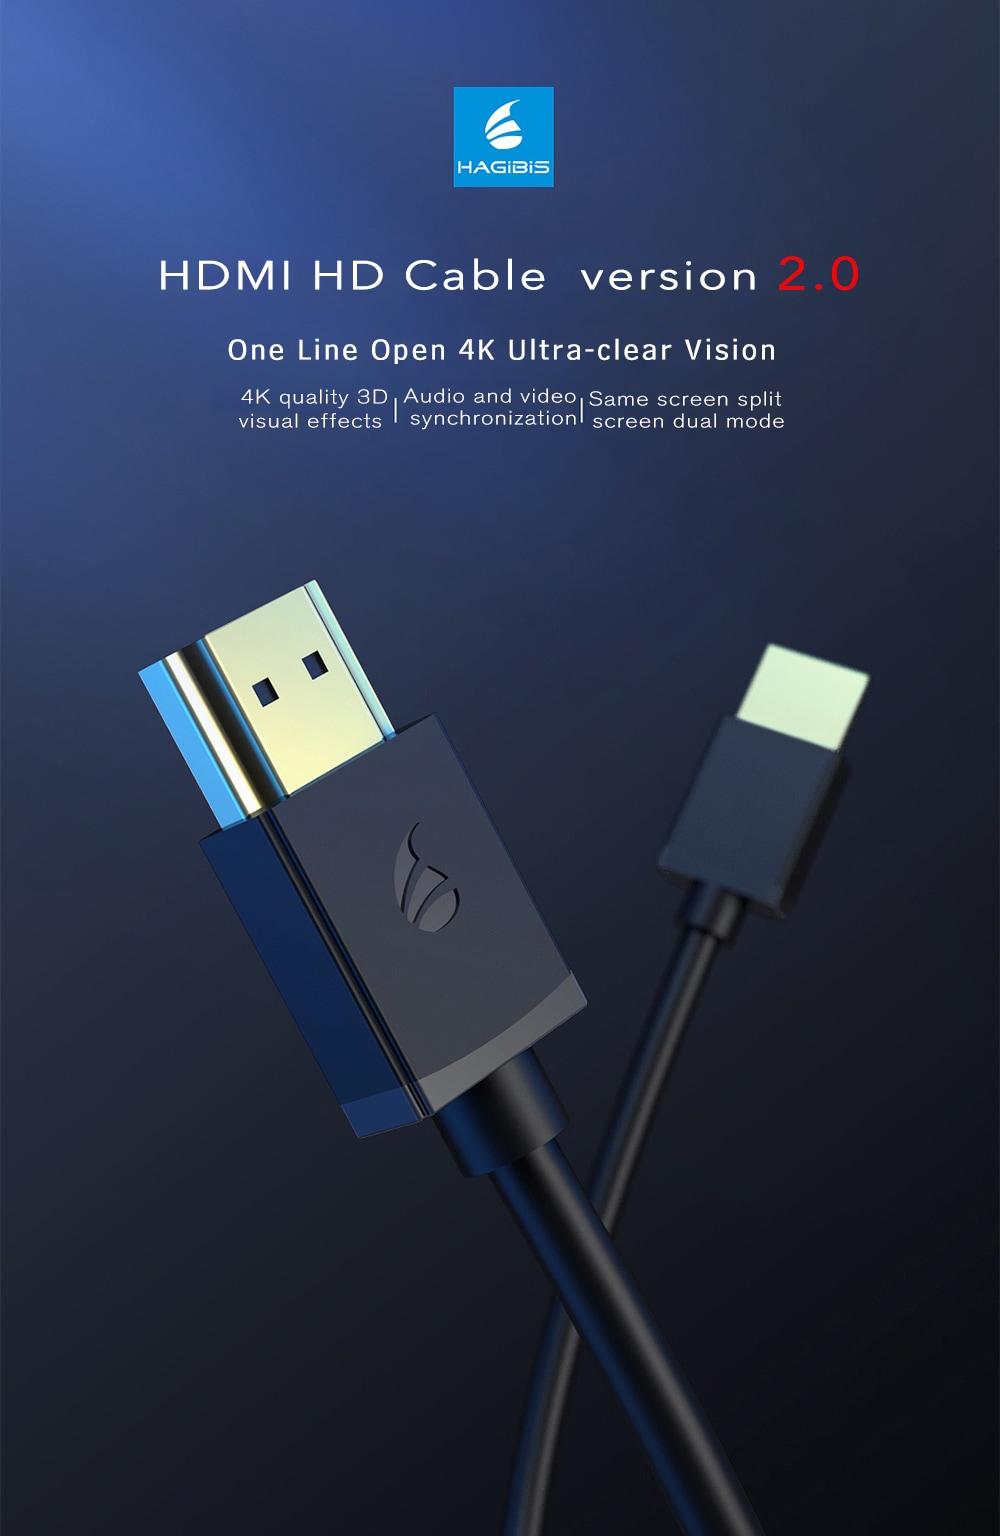 HAGIBIS HDMI HD Cable 2M from Xiaomi youpin- Black